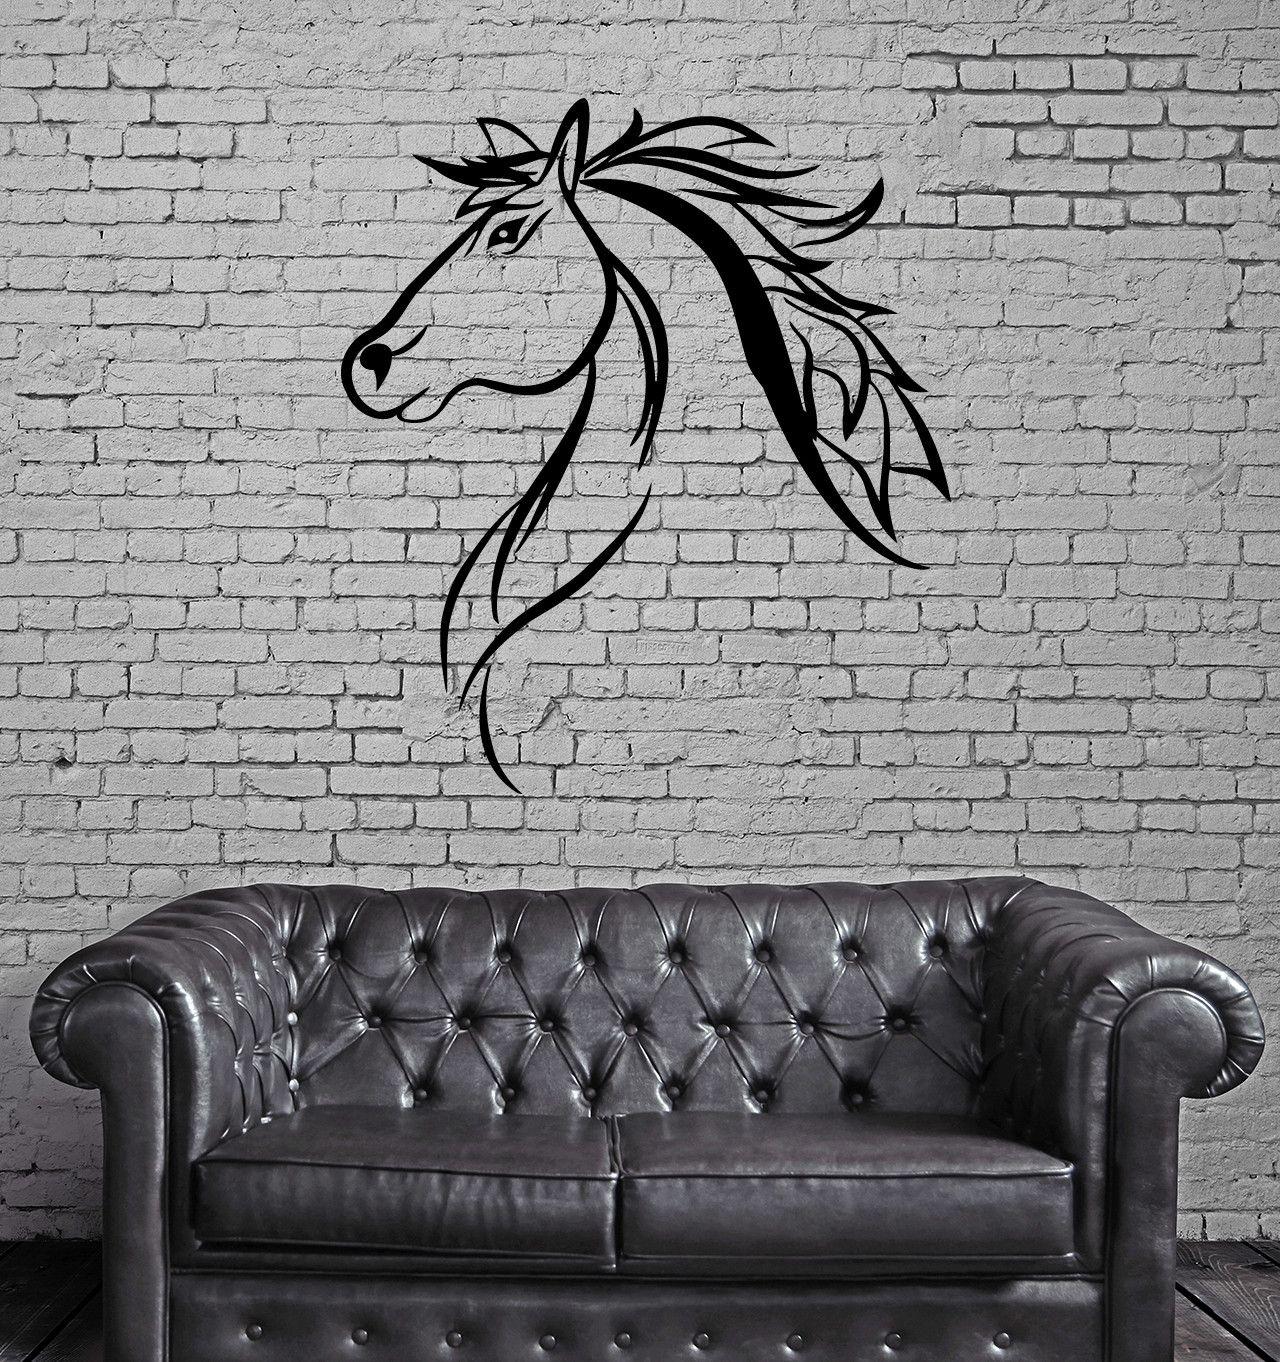 Popular Wallpaper Horse Wall - 913a748e90b08cea0378999f374cf820  Graphic_715644.jpg